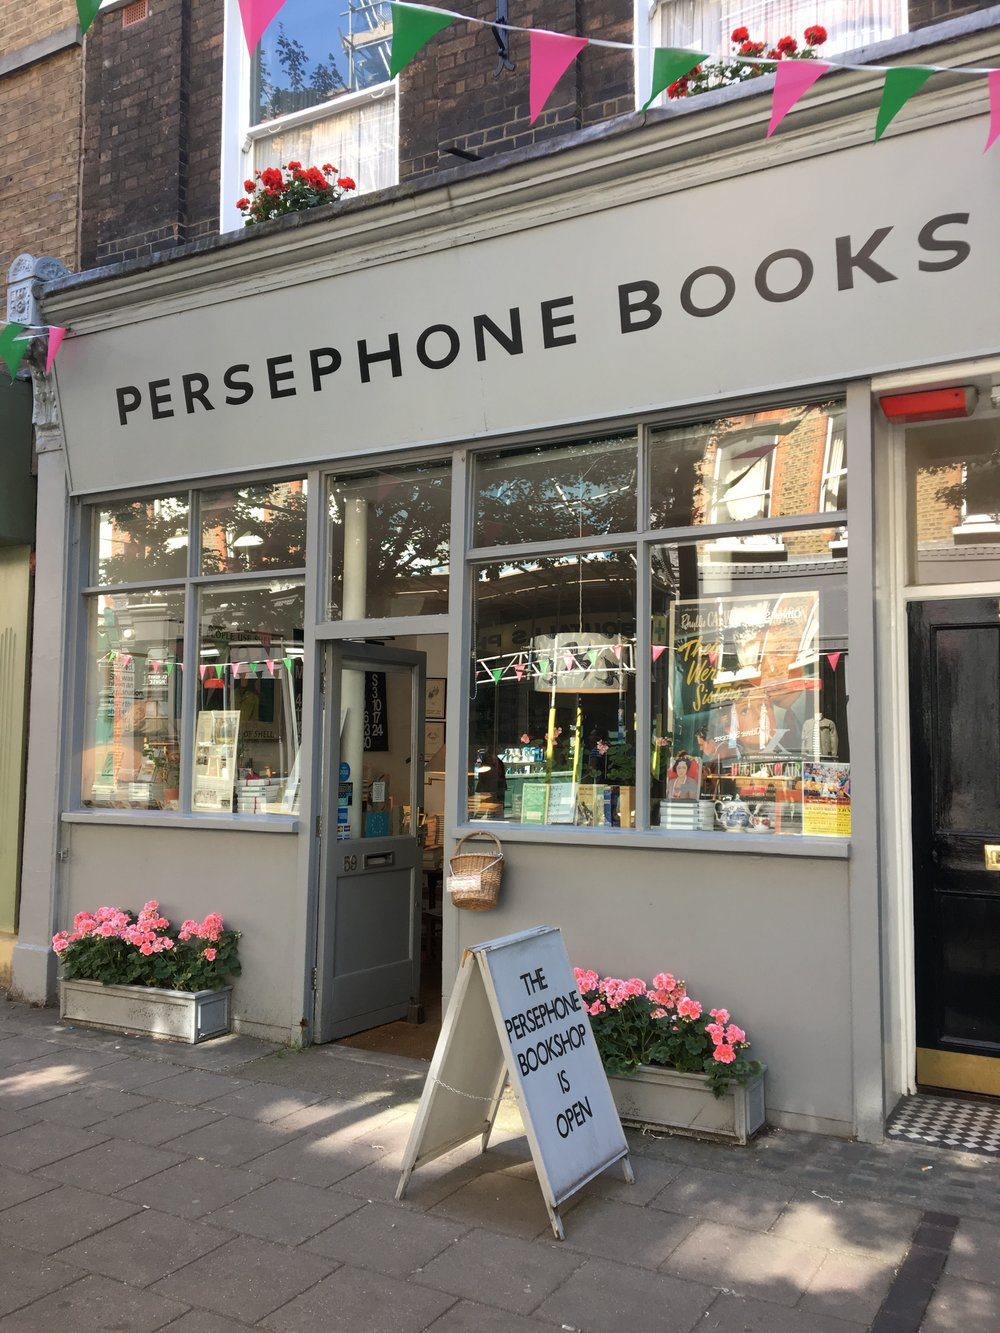 Persephone Books, Lamb's conduit Street, London.